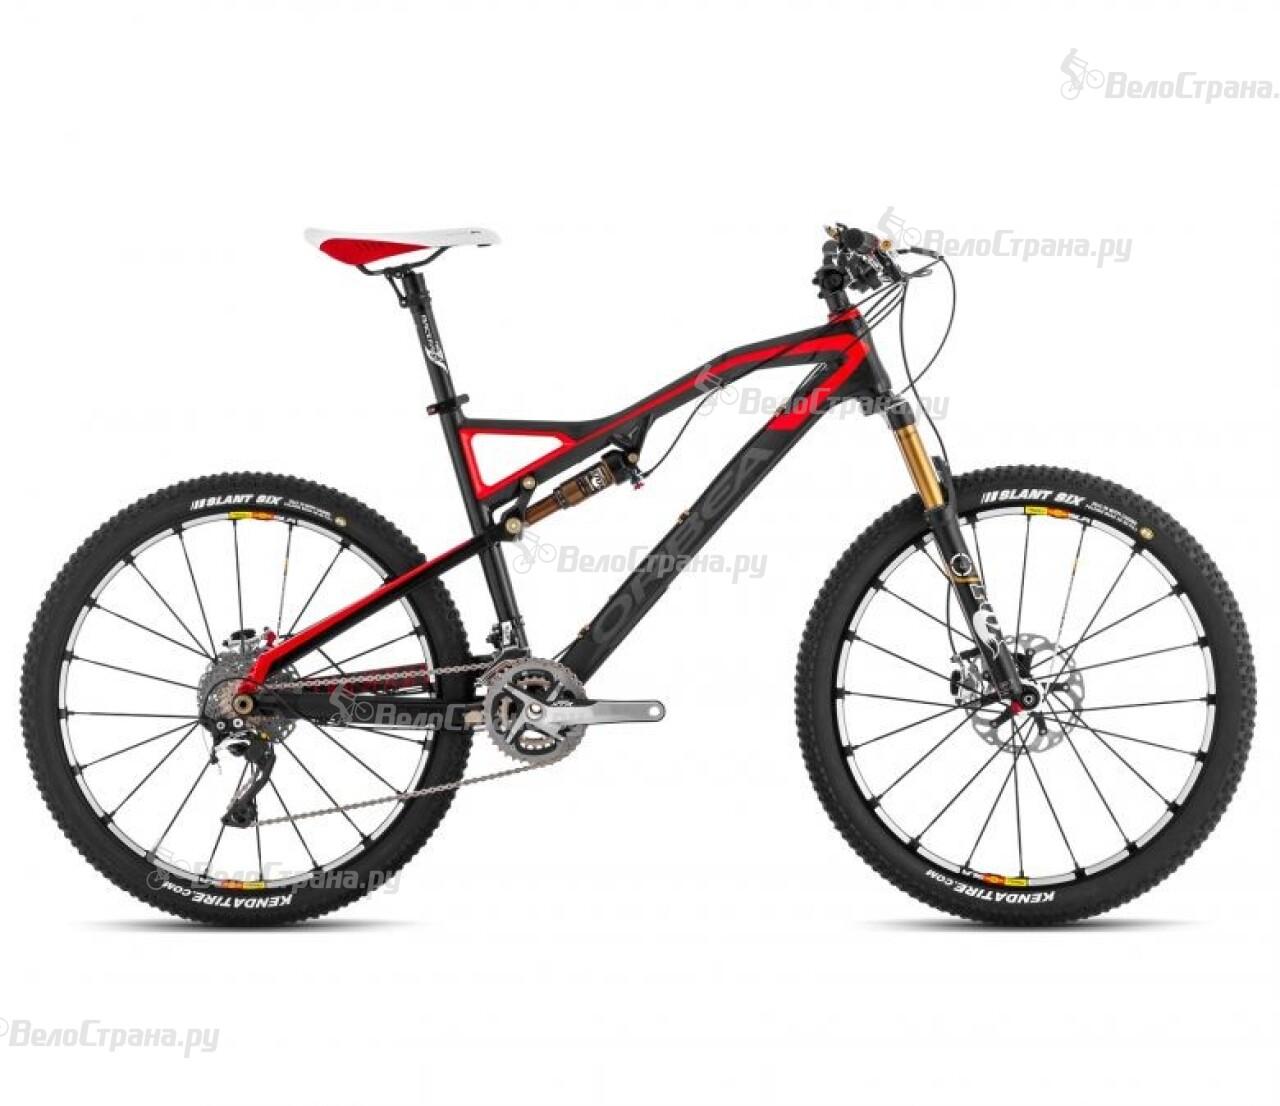 Велосипед Orbea Occam M10 (2014) 1010605